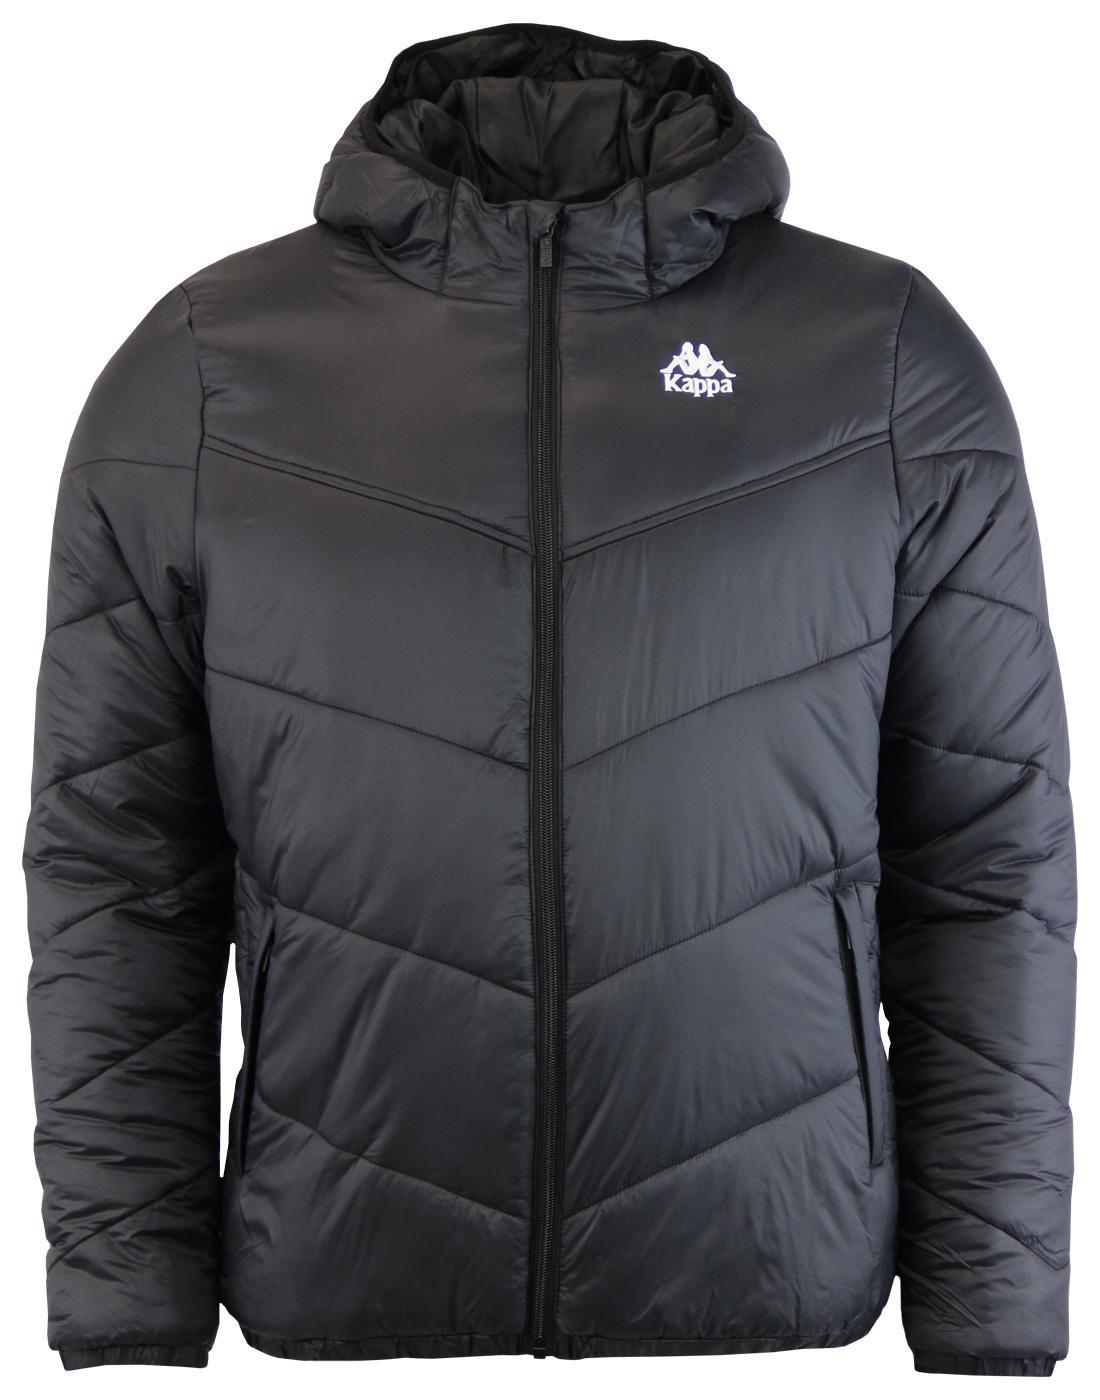 Ramos KAPPA Retro 80s Hooded Chevron Quilt Jacket